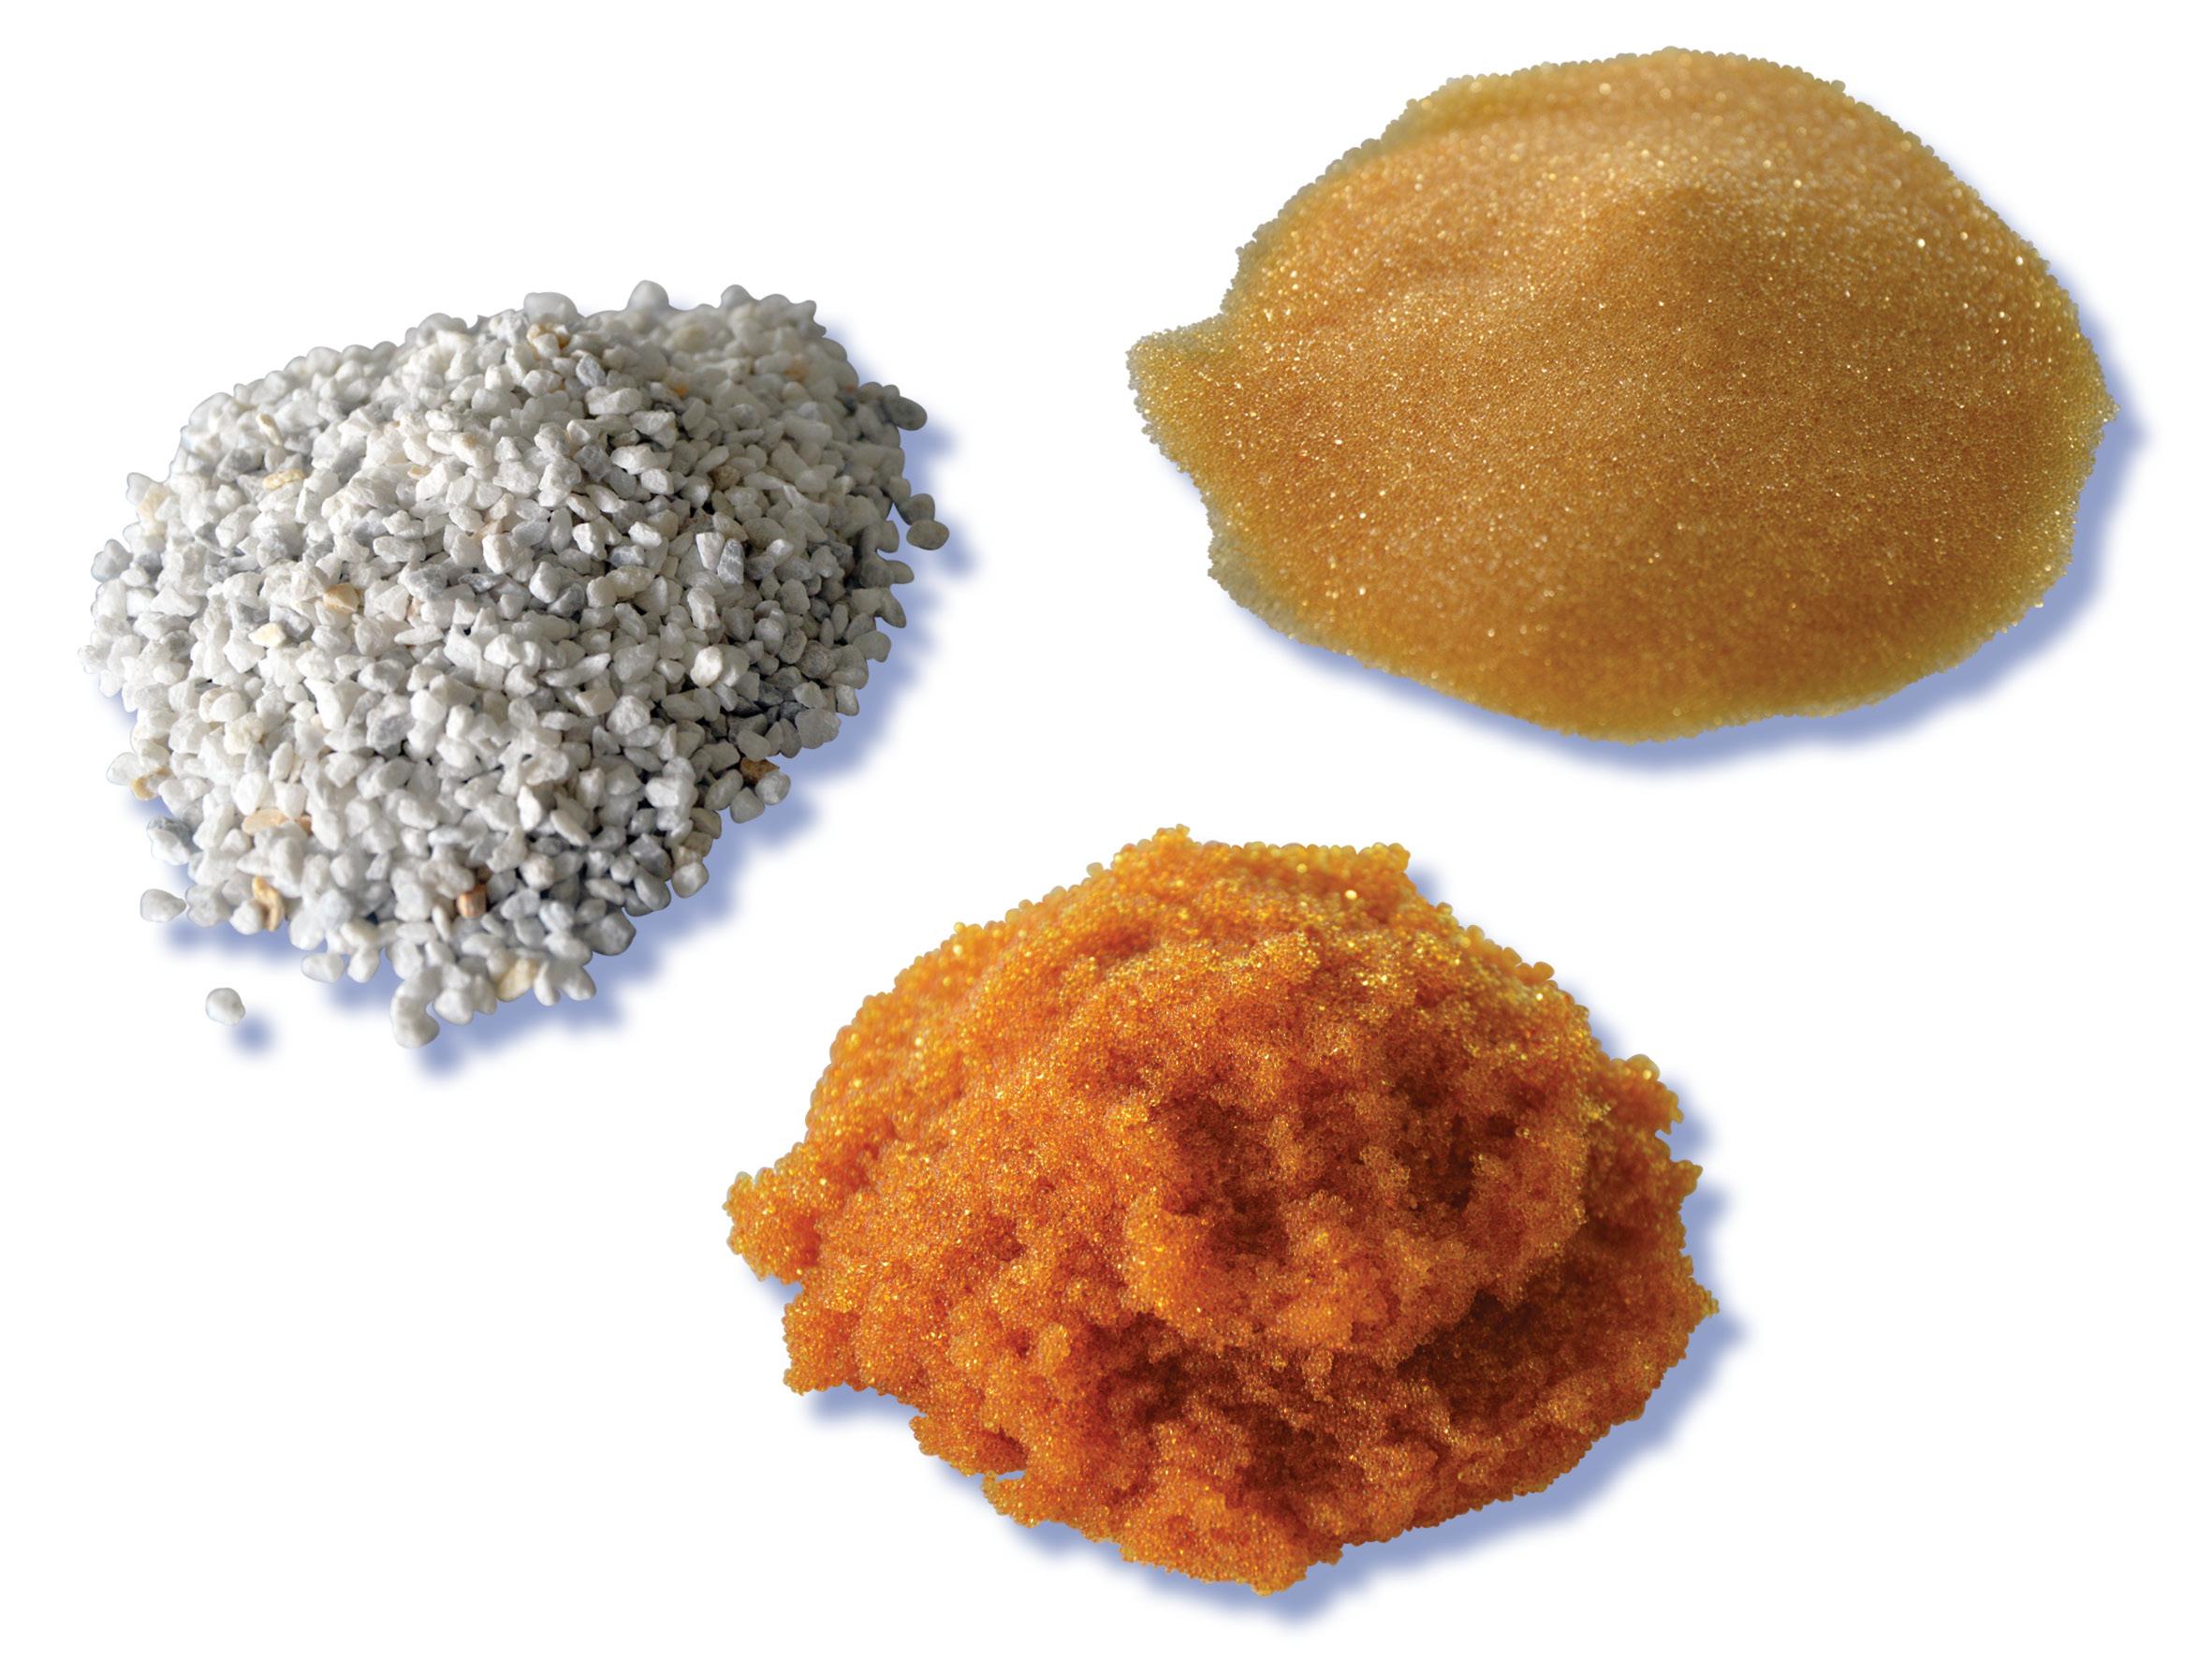 Sali polifosfati Resine